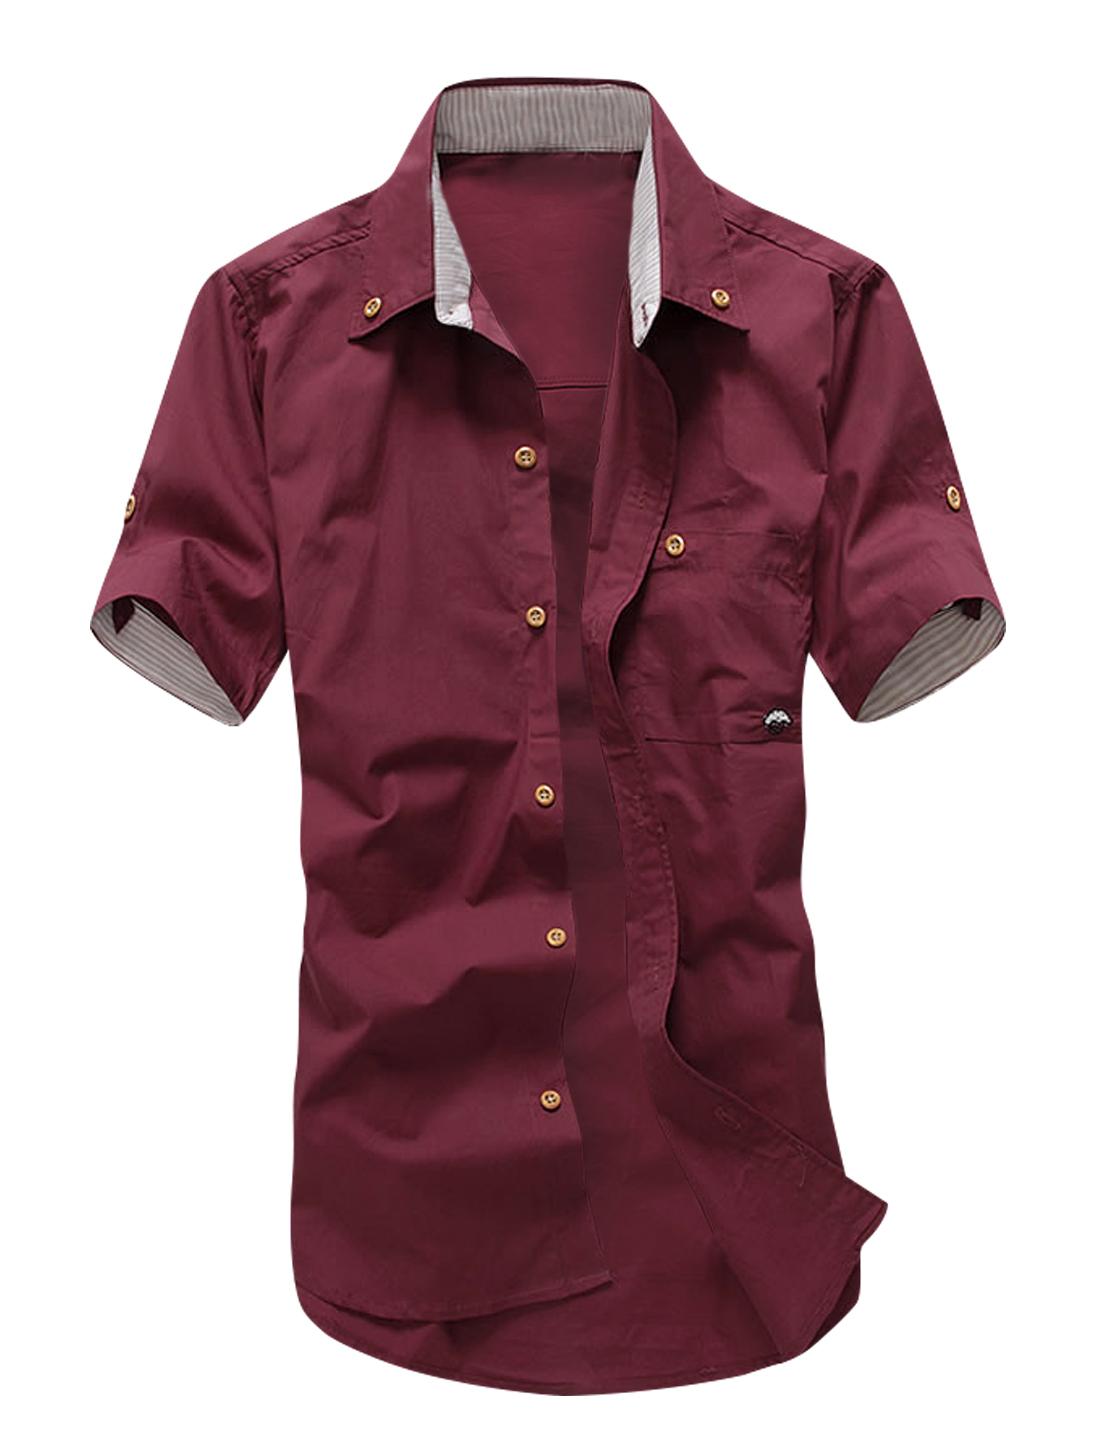 Man Striped Panel Short Sleeves Button Down Shirts Burgundy M